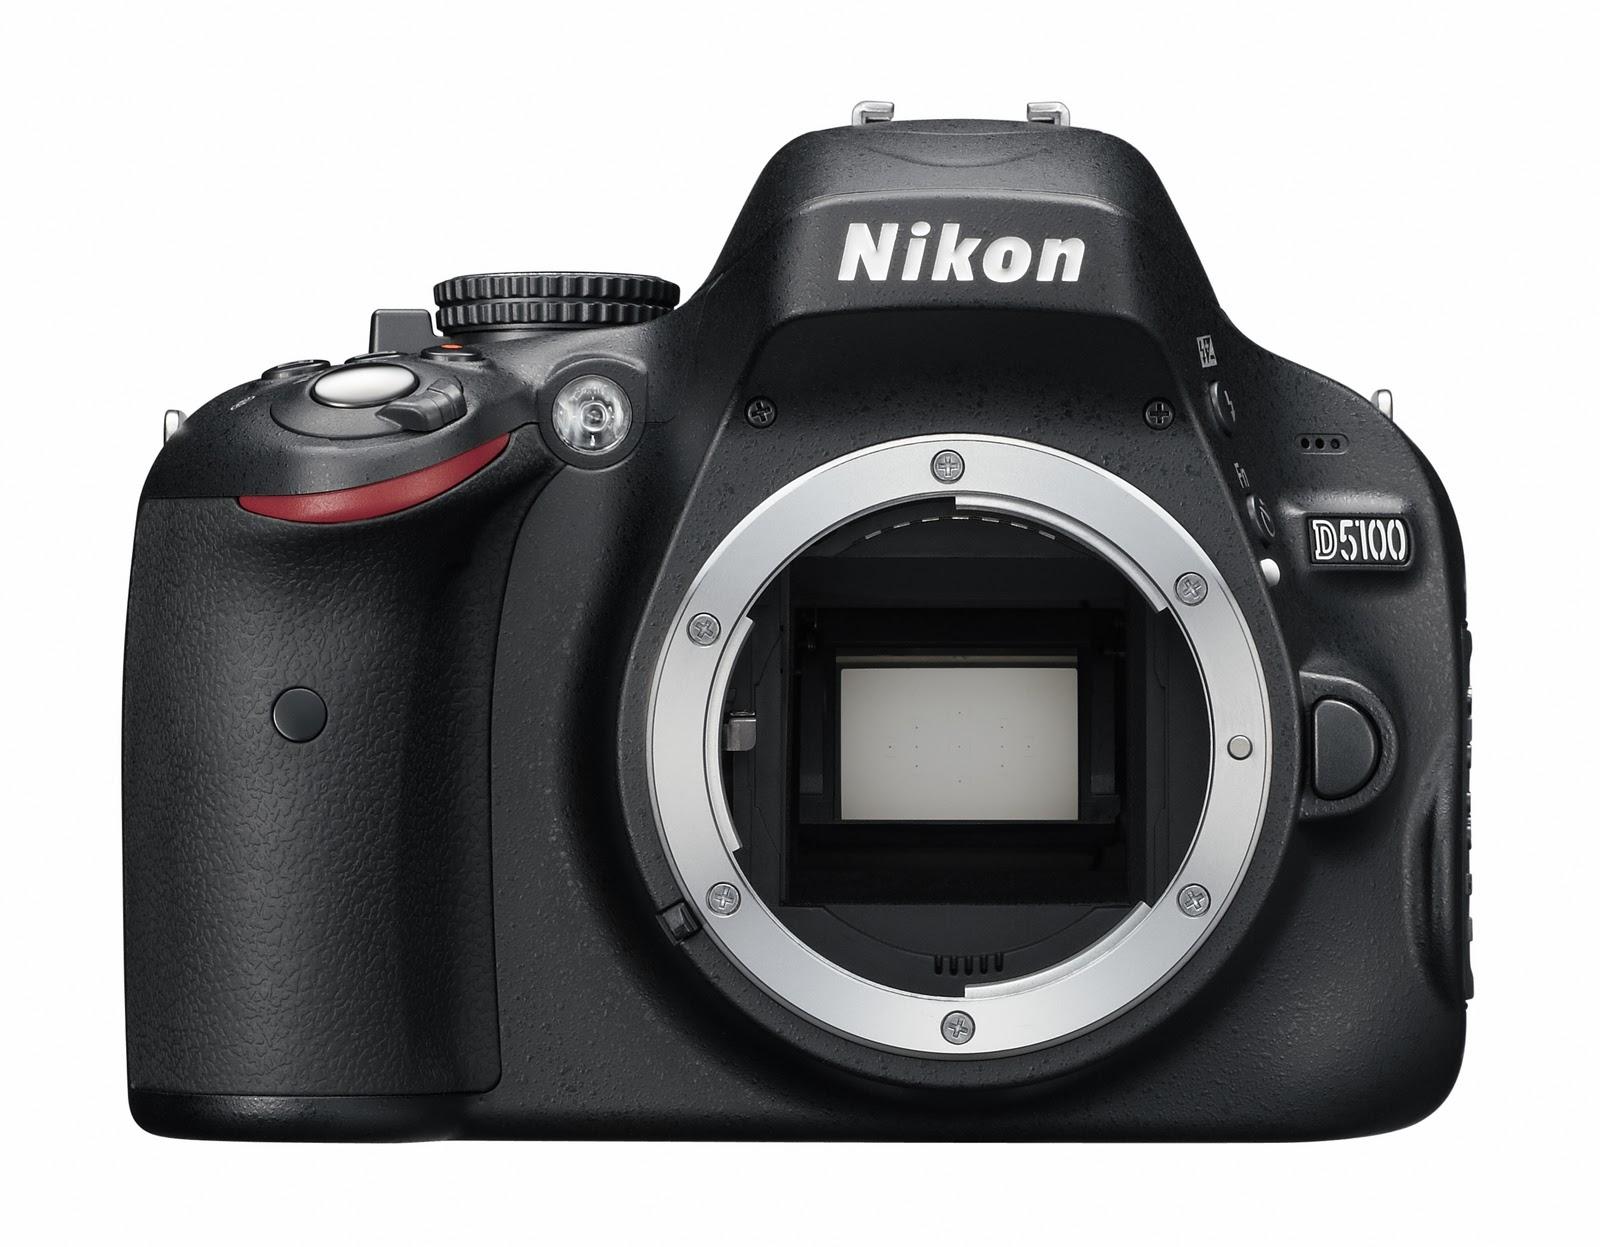 nikon d3100 spejlreflekskamera